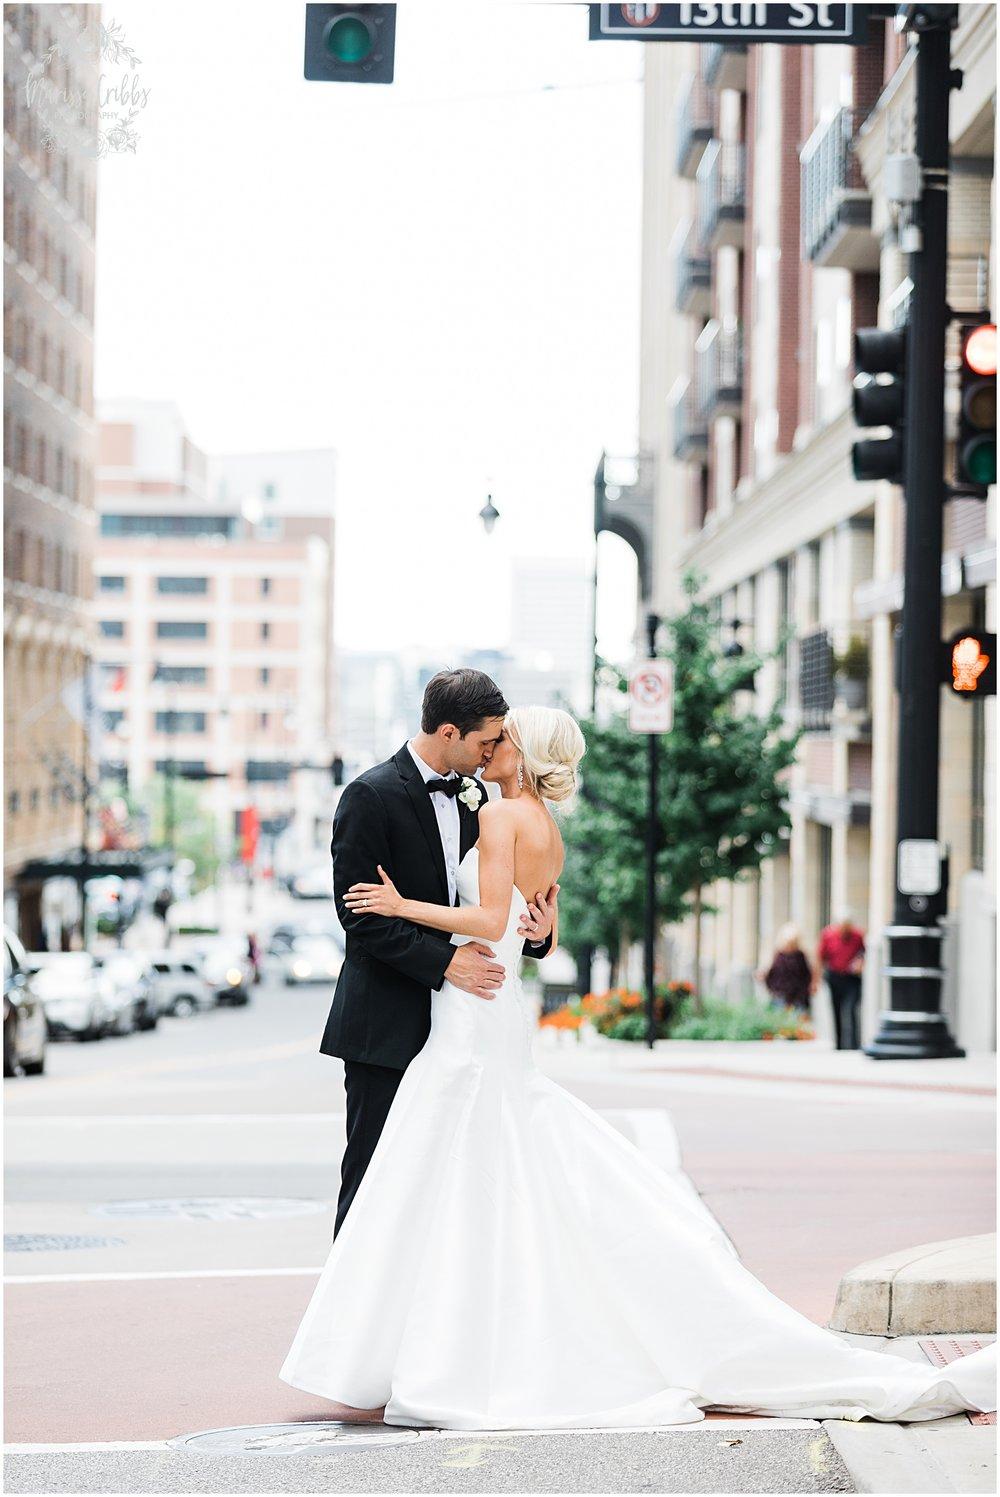 NOLL WEDDING | THE BRASS ON BALTIMORE | MARISSA CRIBBS PHOTOGRAPHY_6342.jpg